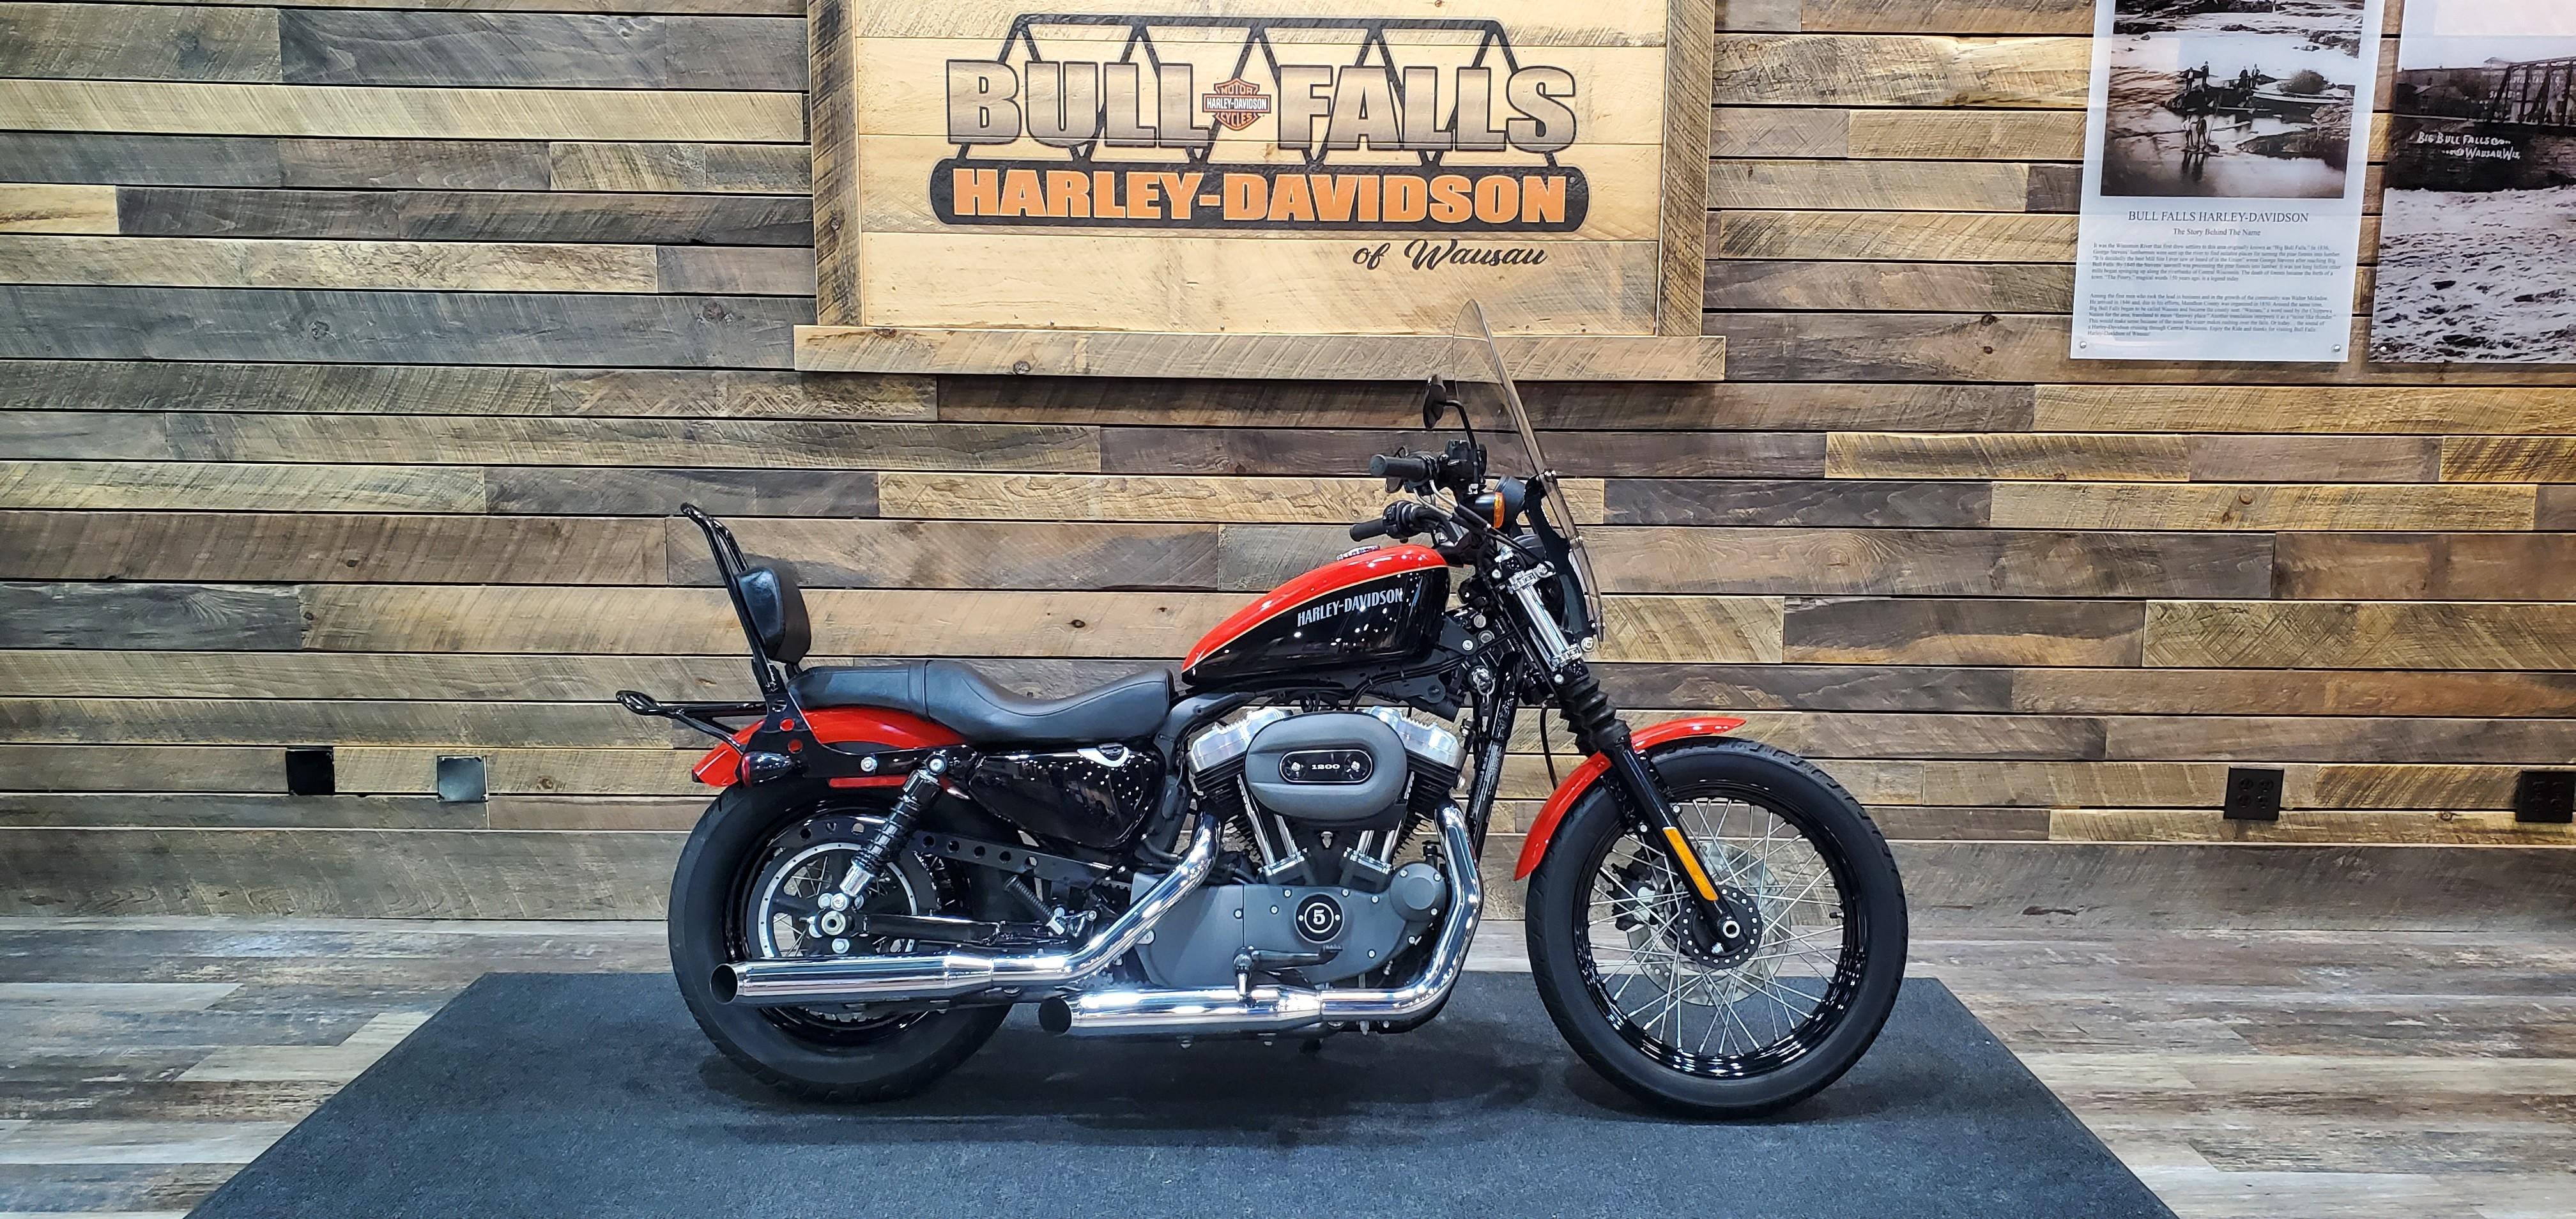 2011 Harley-Davidson Sportster 1200 Nightster at Bull Falls Harley-Davidson